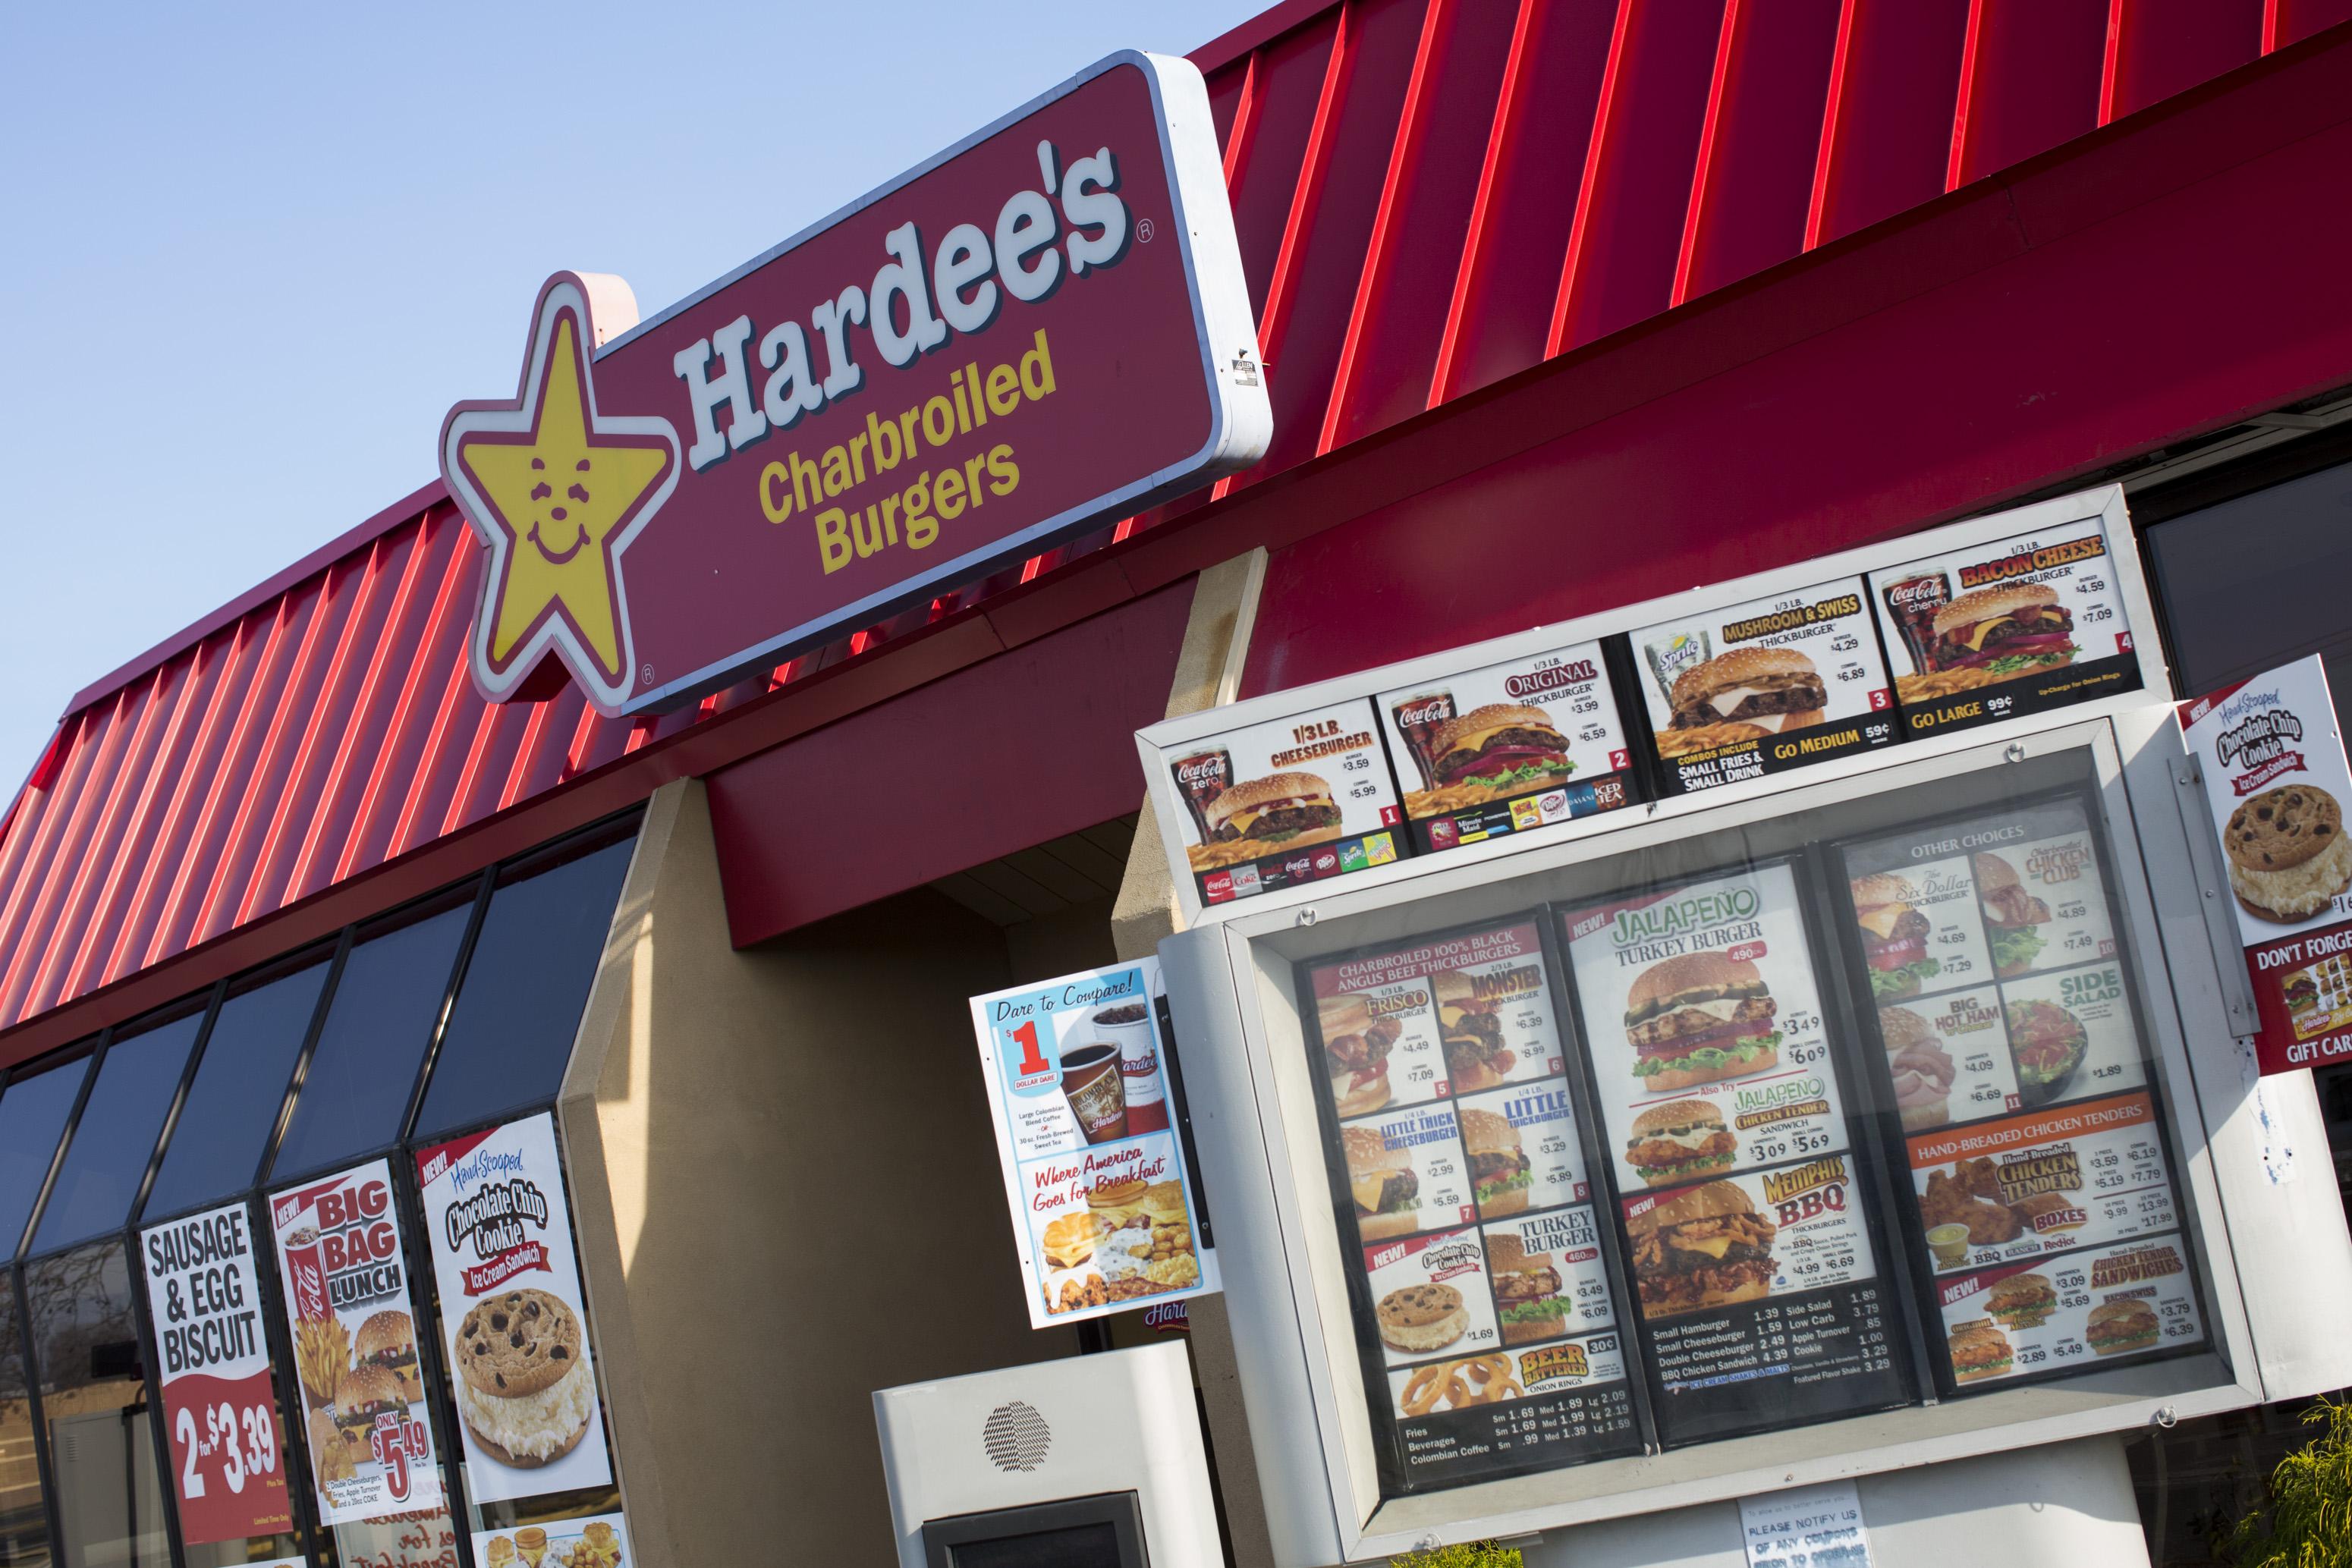 A Hardee's fast food restaurant in Milford, Delaware, December 25, 2012.